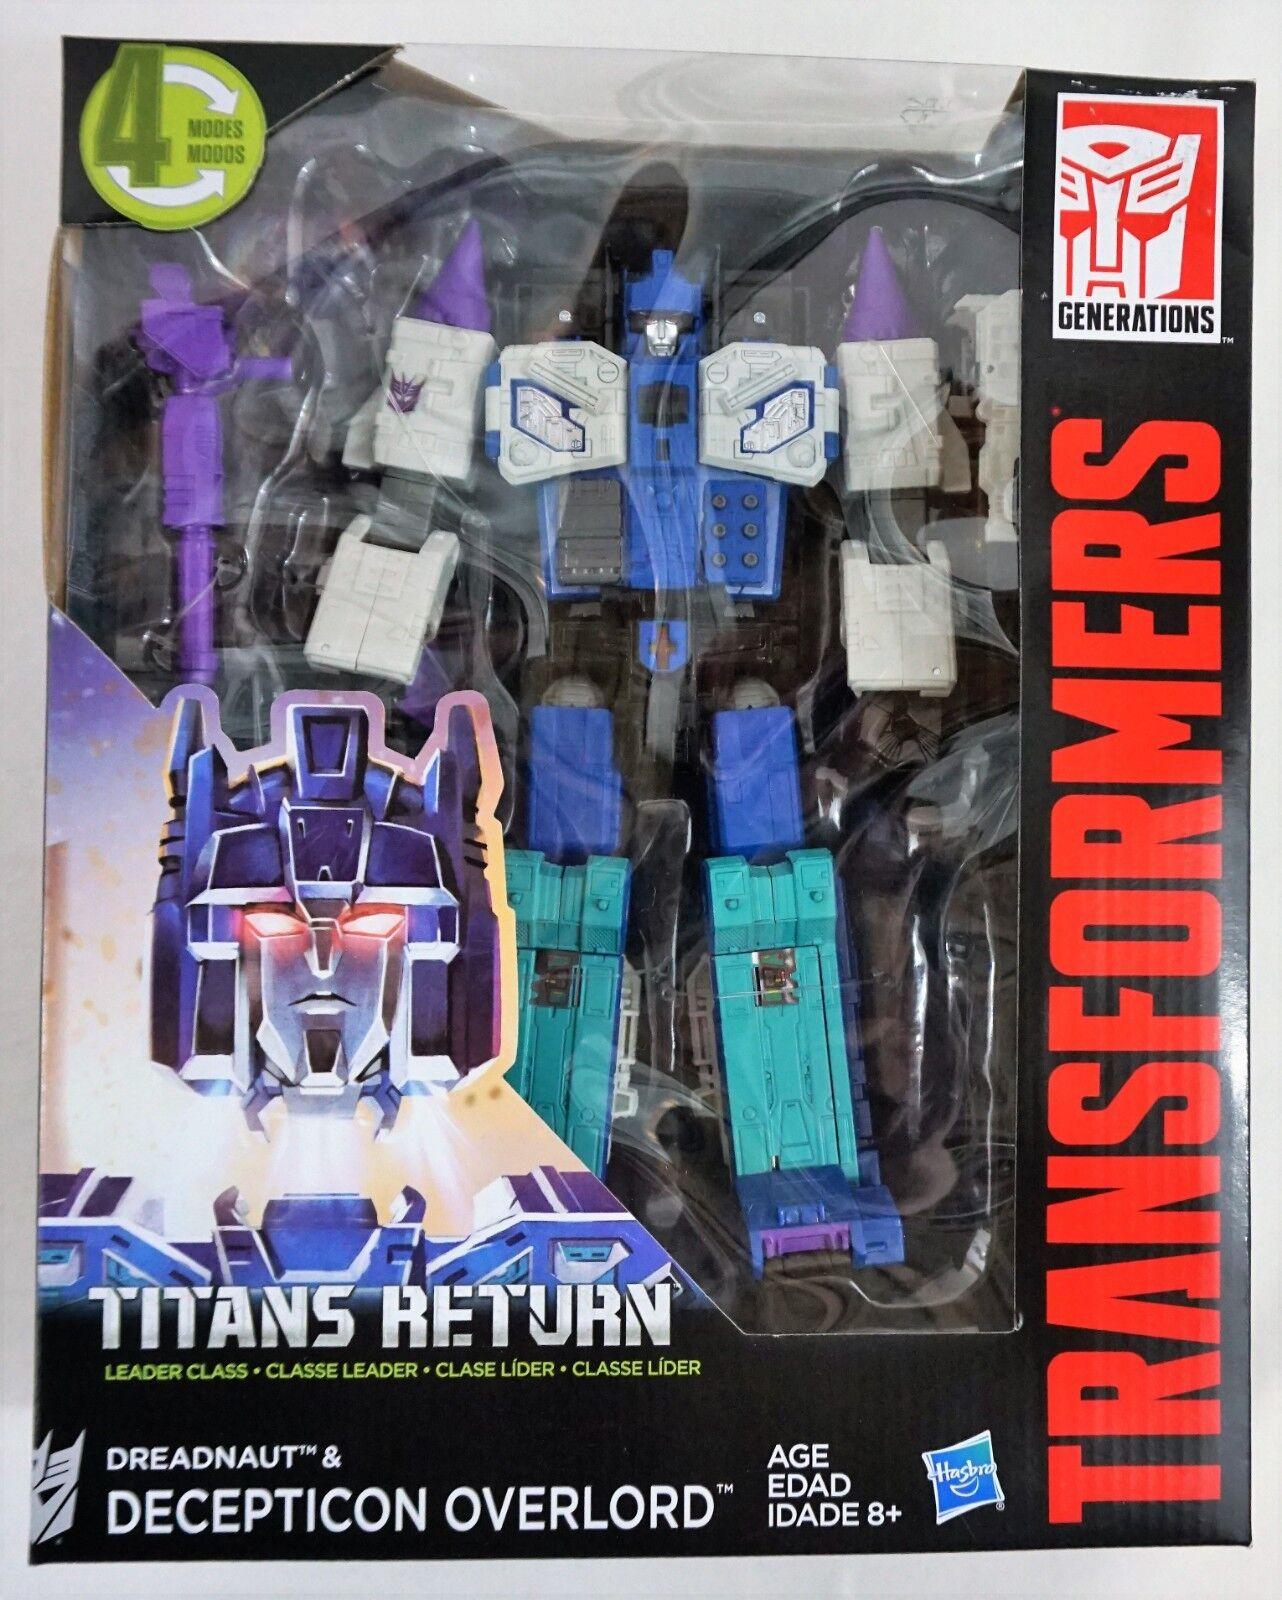 NEW (Unopened) HASBRO Transformers Titans Return Dreadnaut & Deception Overlord